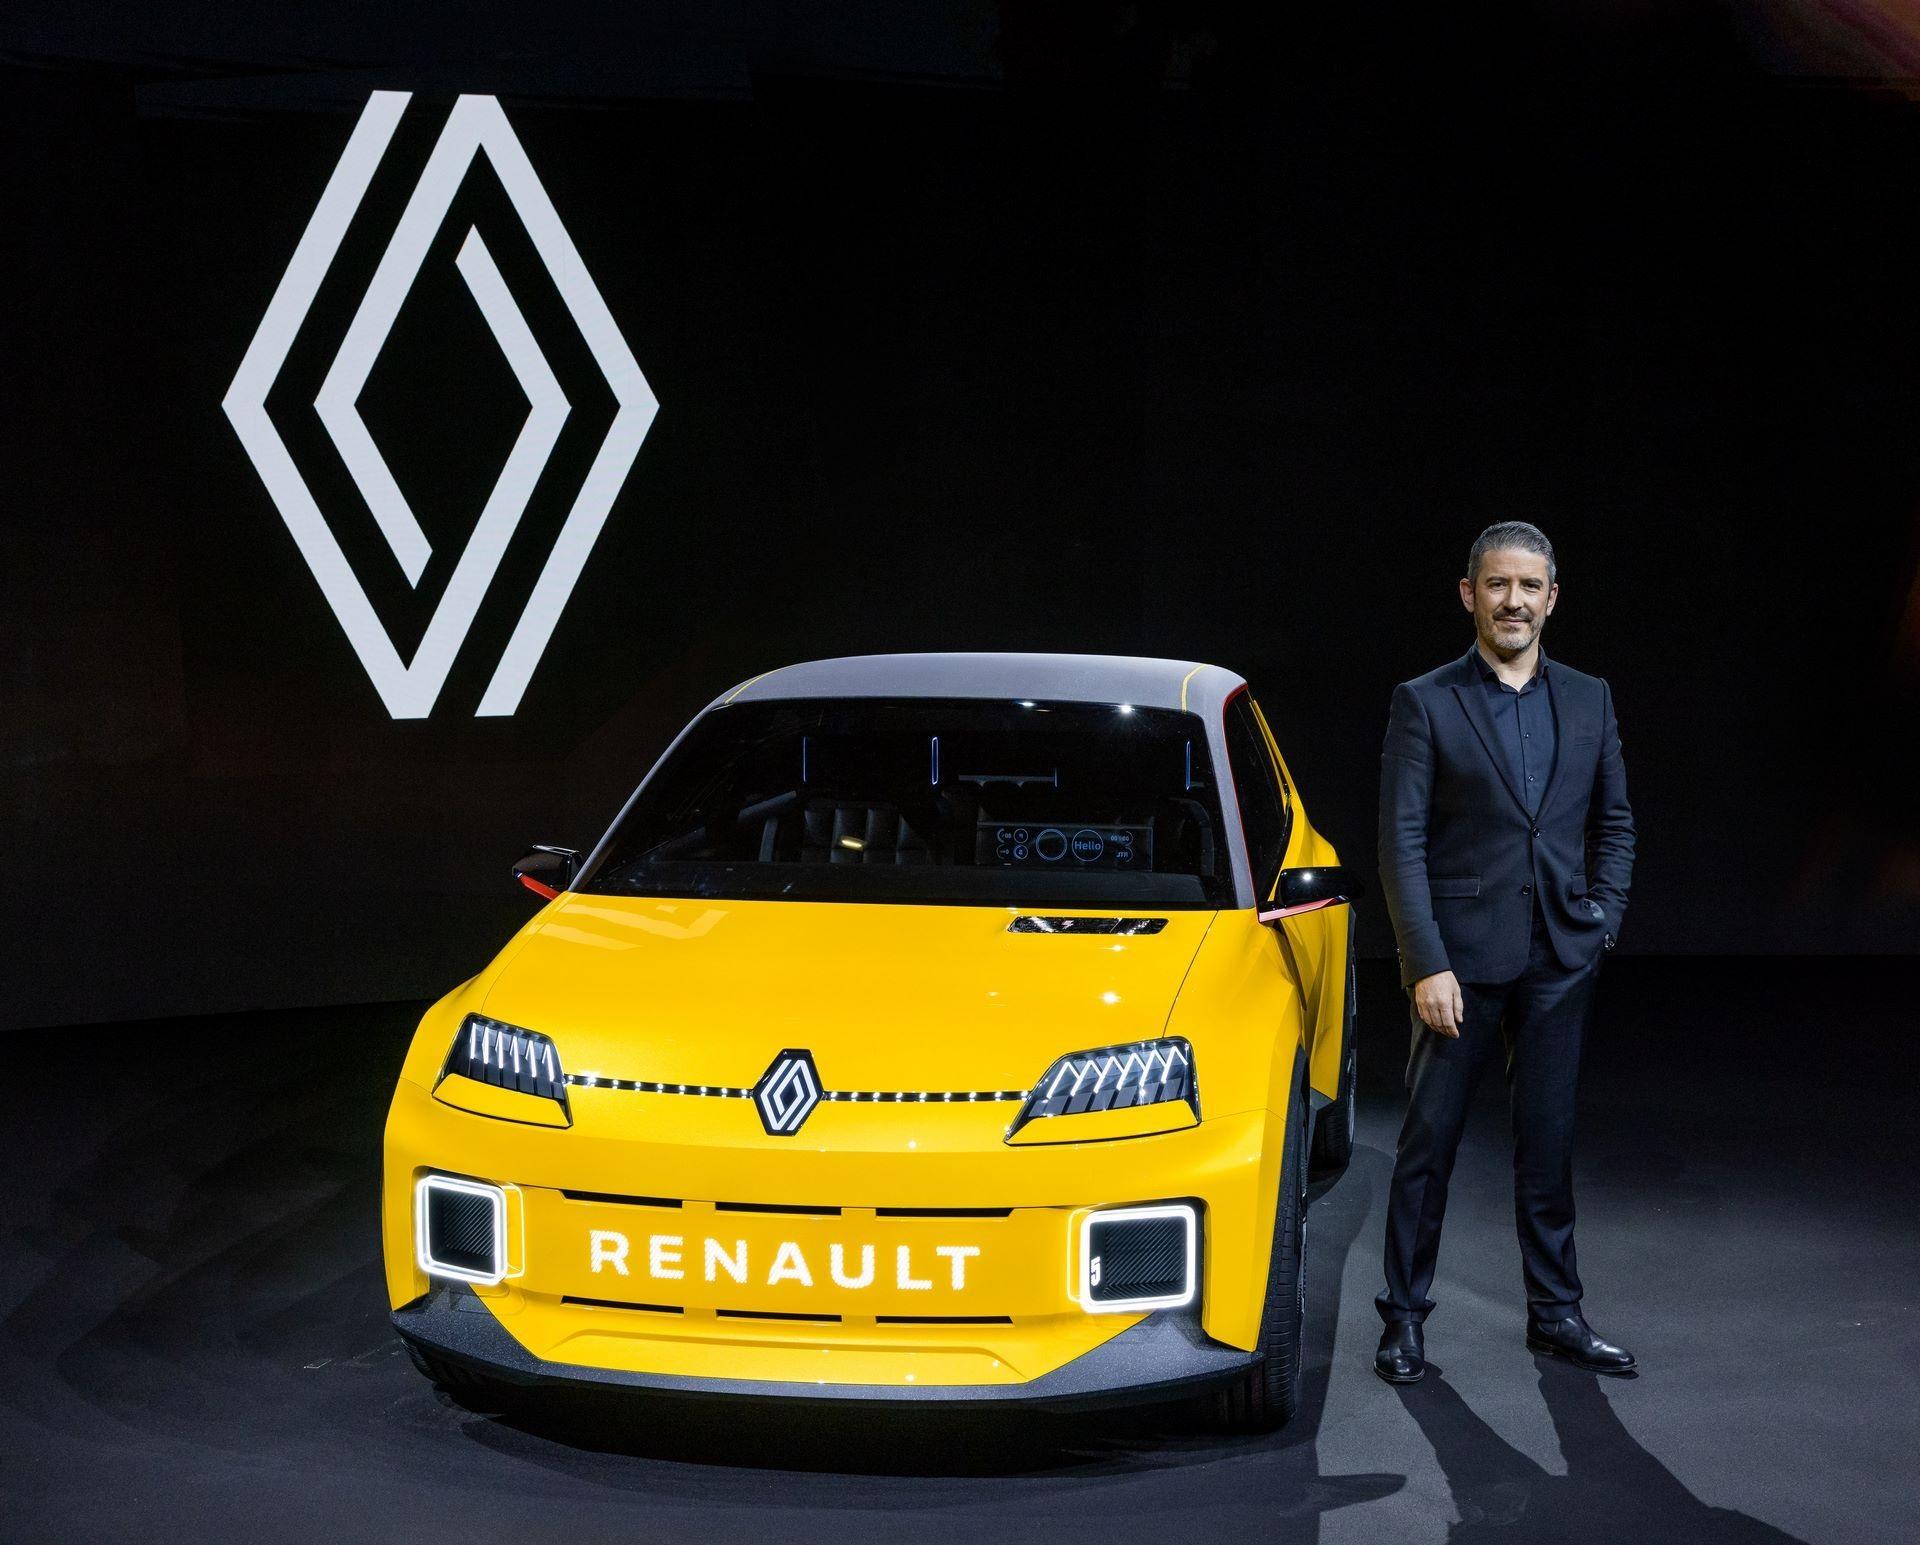 31-2021-Renault-5-Prototype-and-Gilles-VIDAL-designer